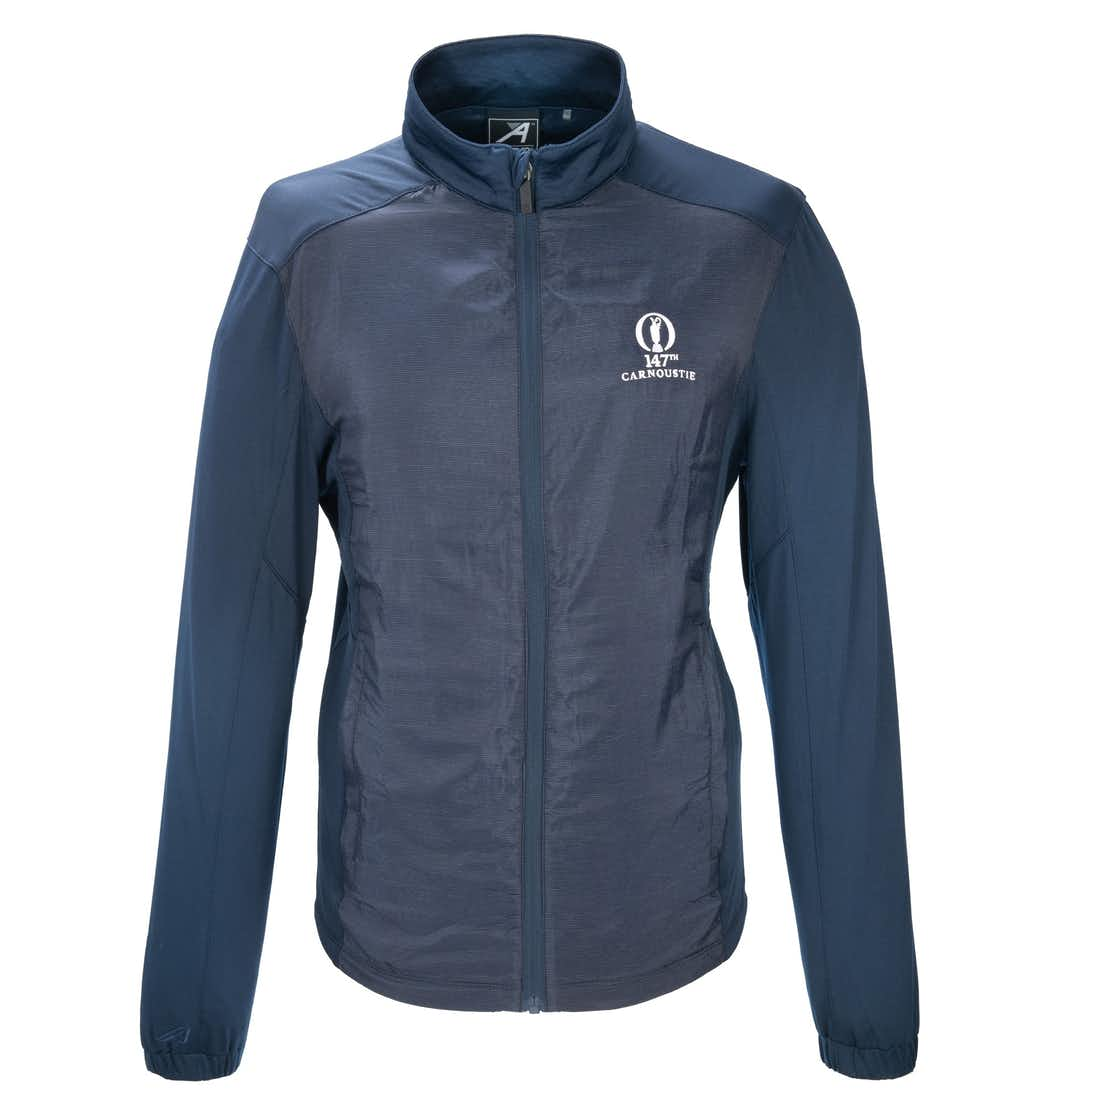 147th Carnoustie Jacket - Blue